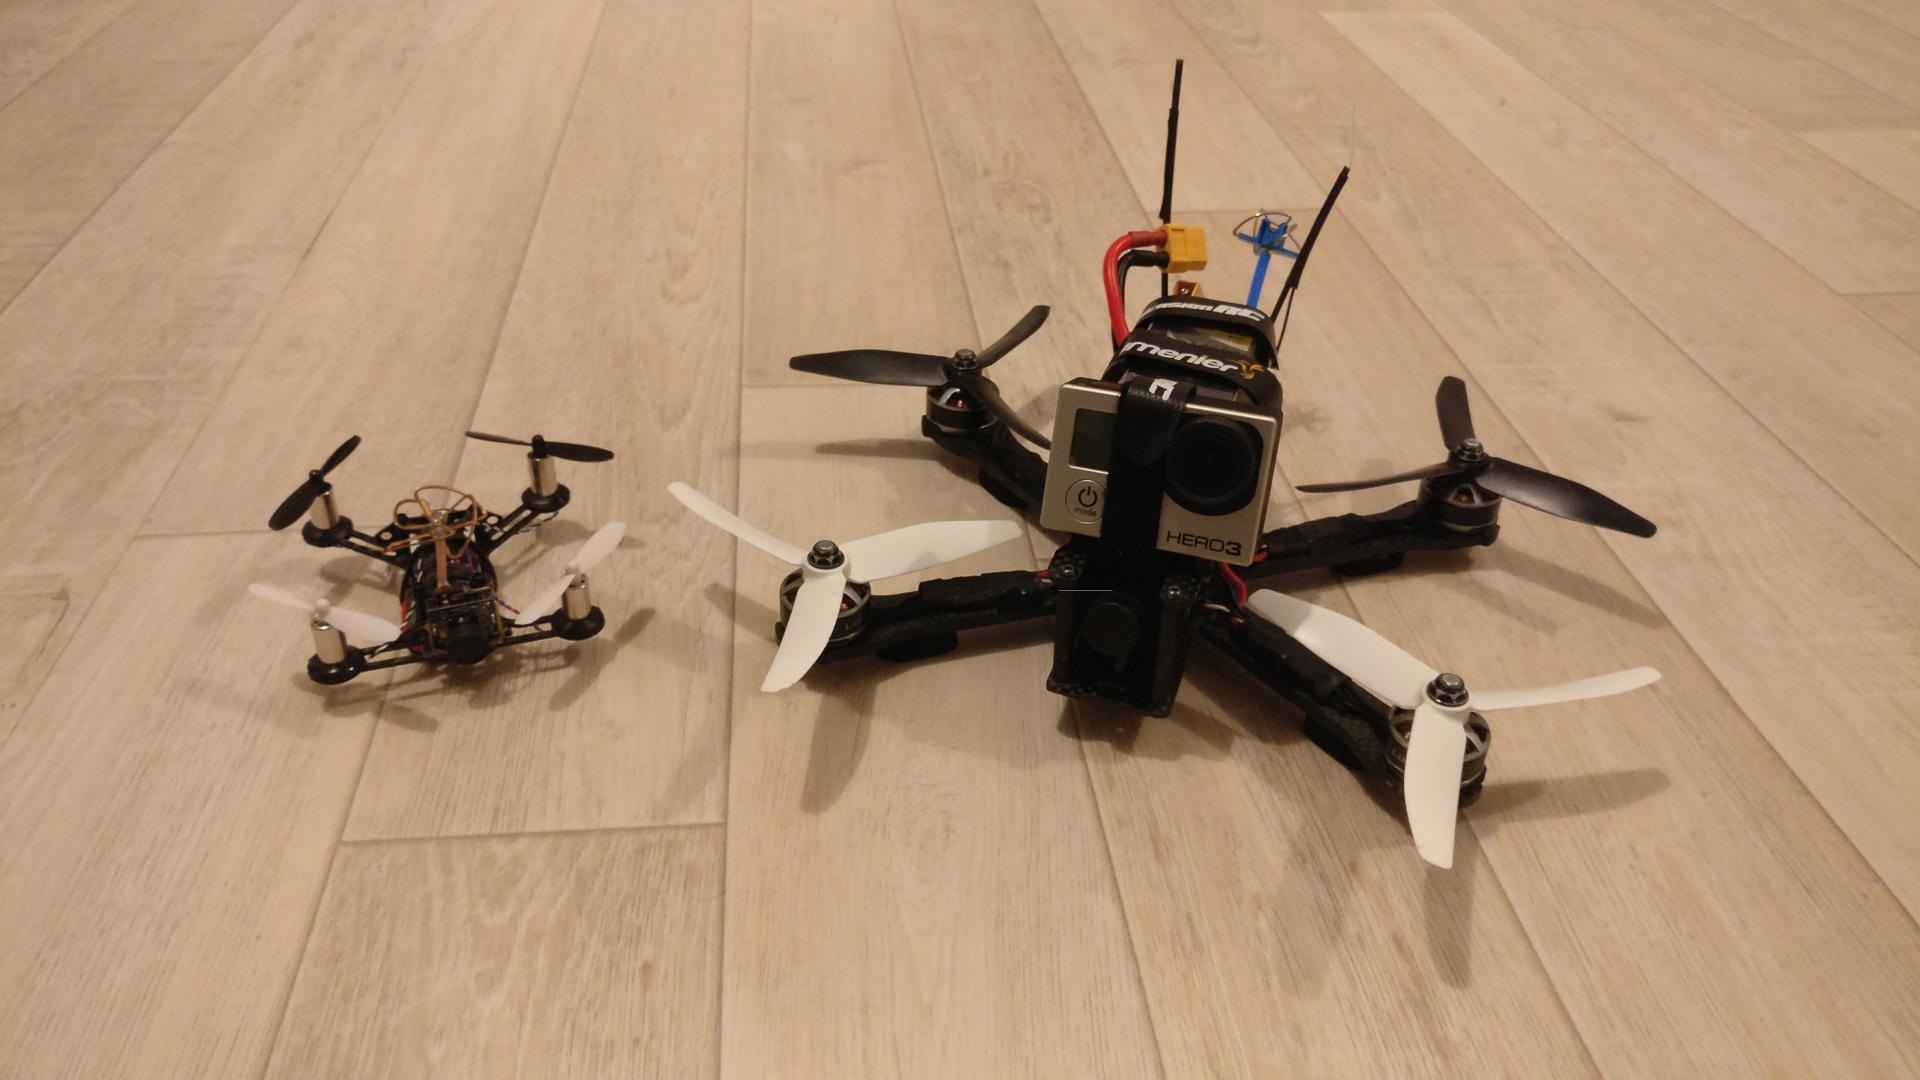 QX95 et QAVR côte à côte